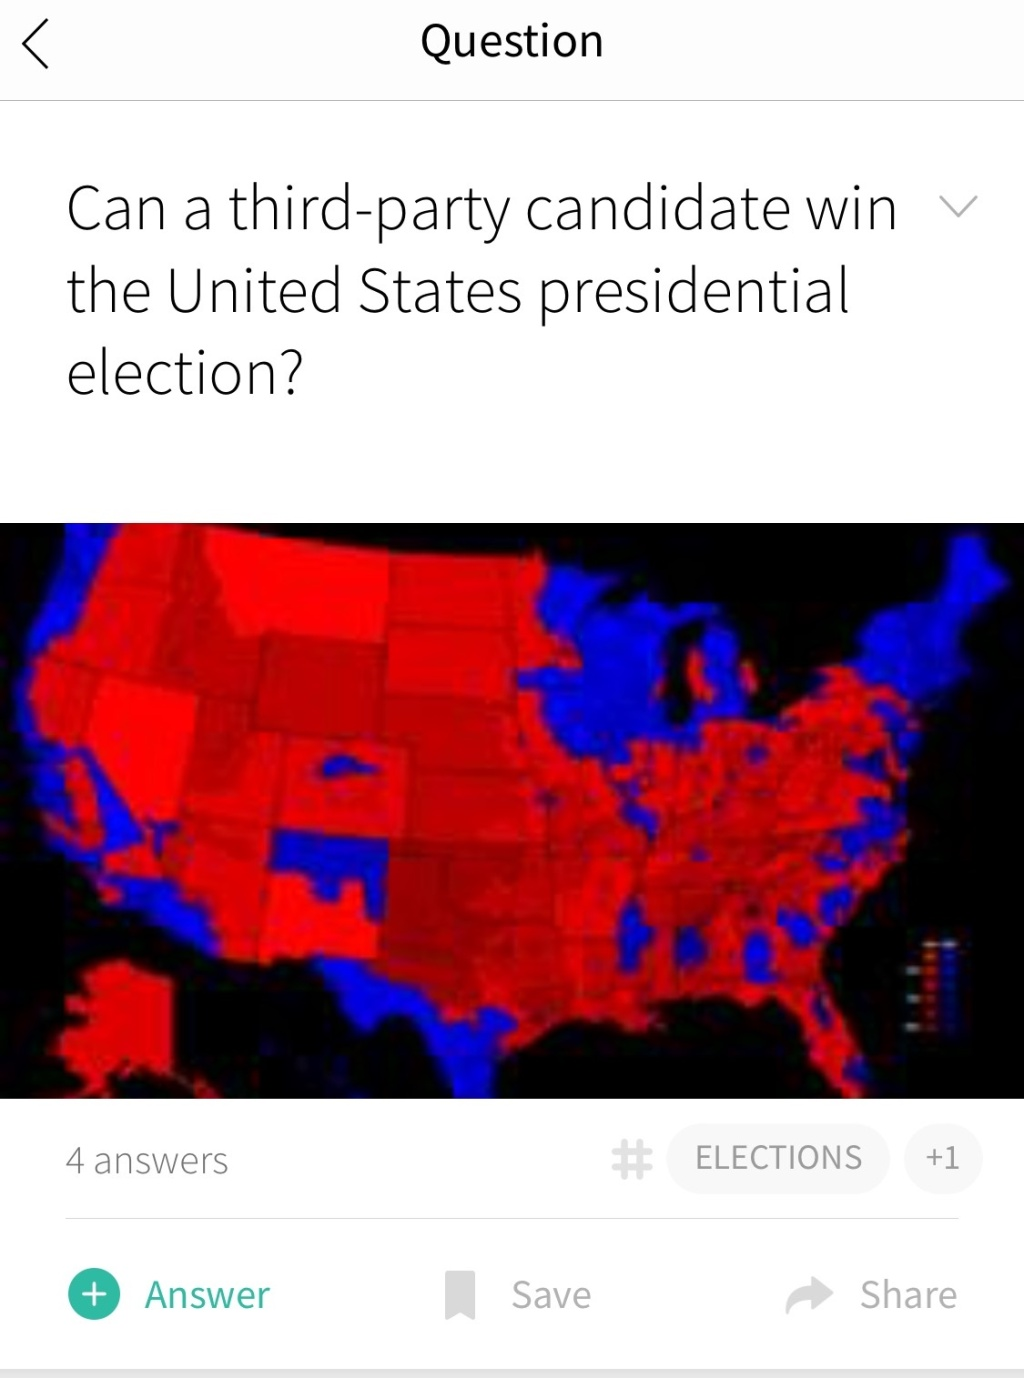 screenshot illustration of electoral map